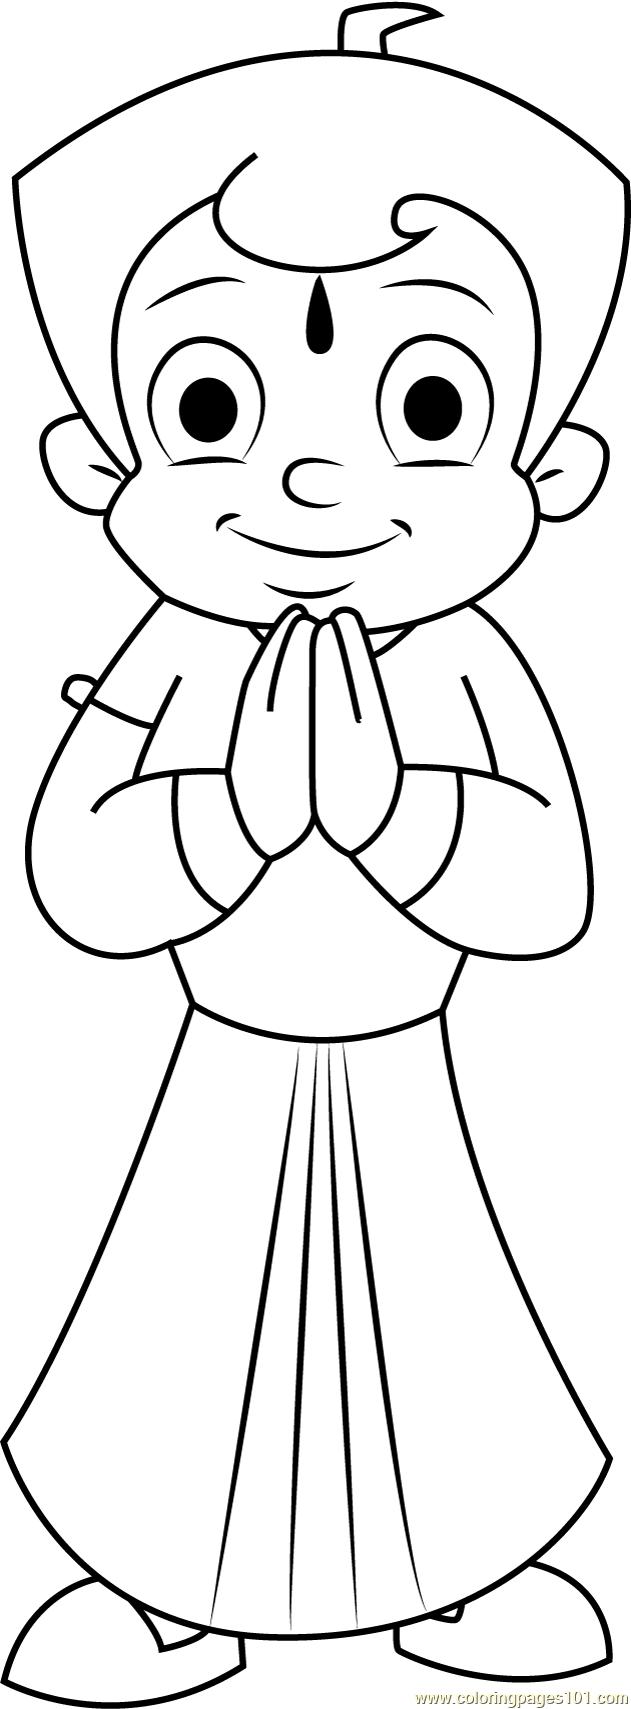 Online Coloring Chota Bheem : Namaste coloring page free chota bheem pages